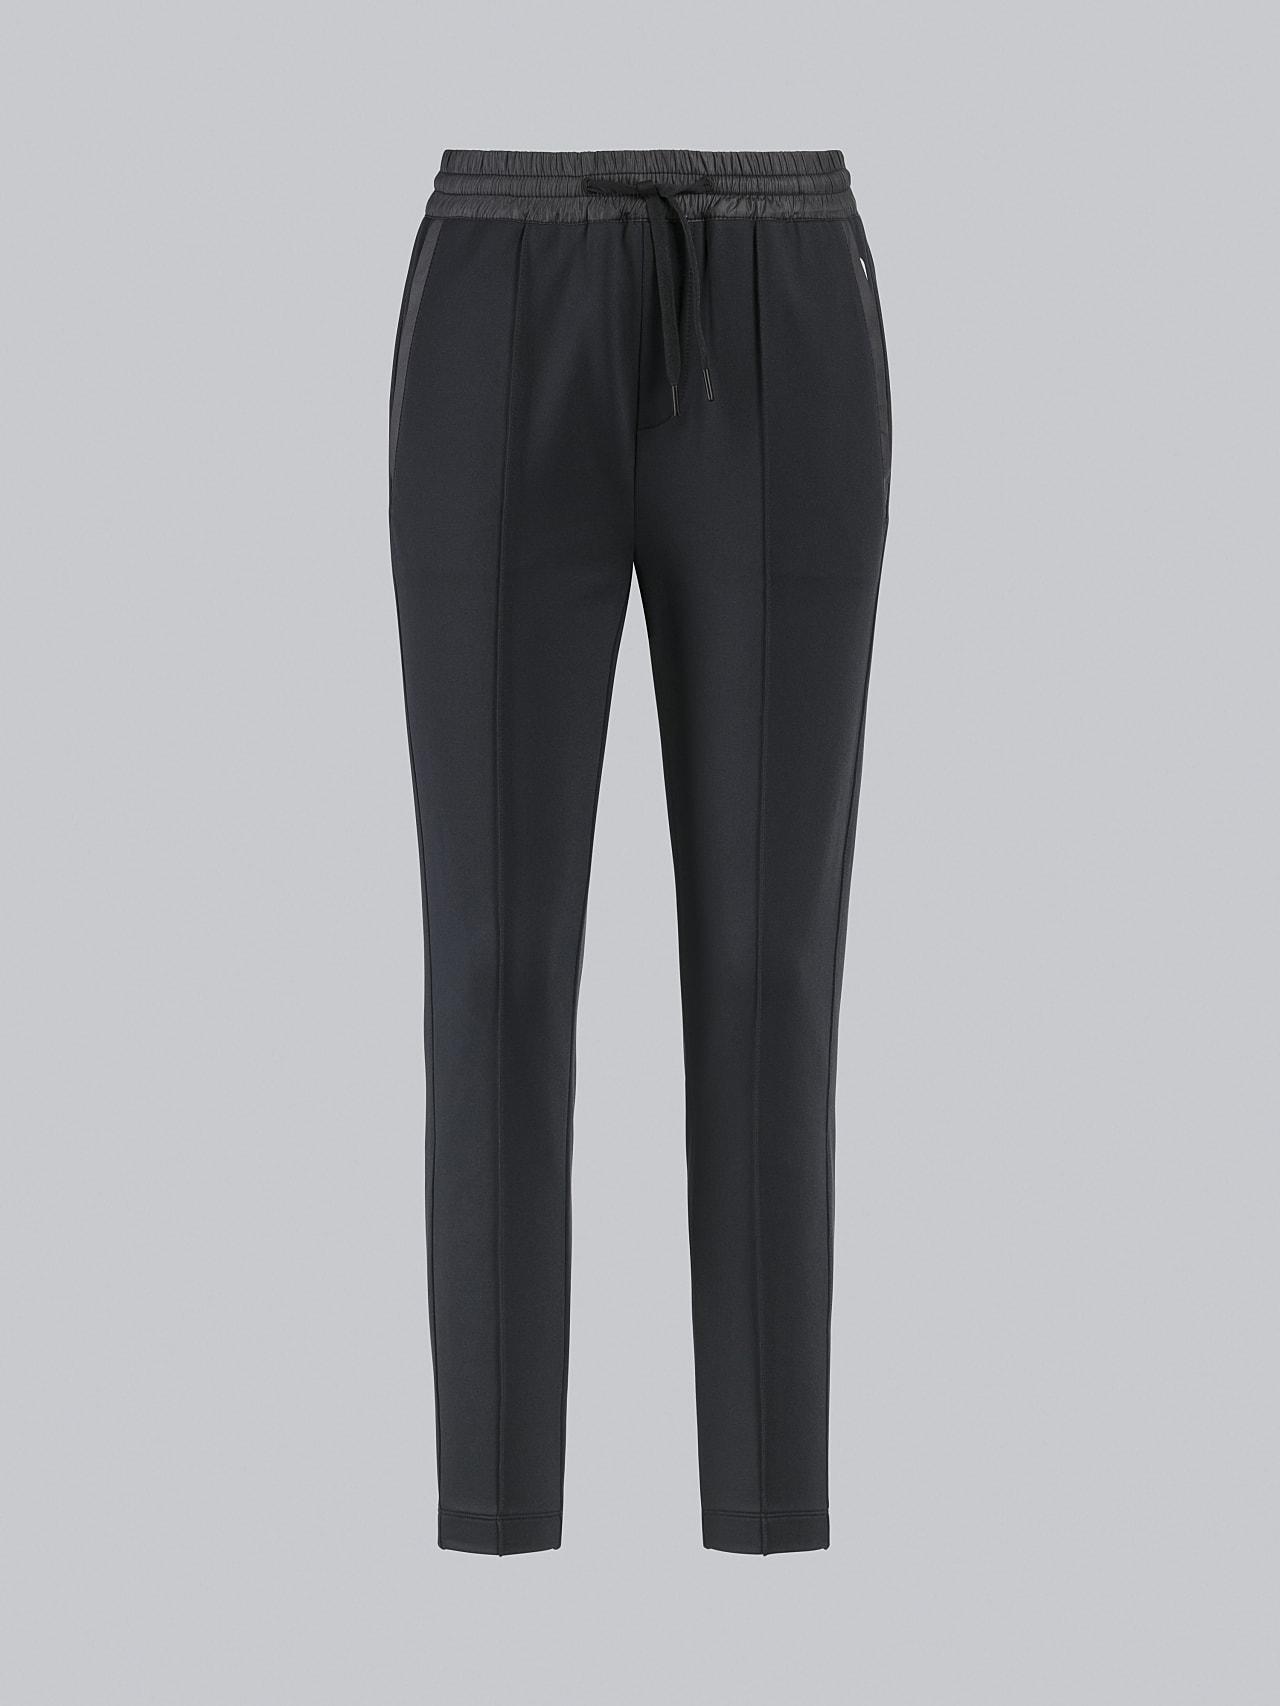 PANTA V1.Y4.02 Cropped Pants black Back Alpha Tauri